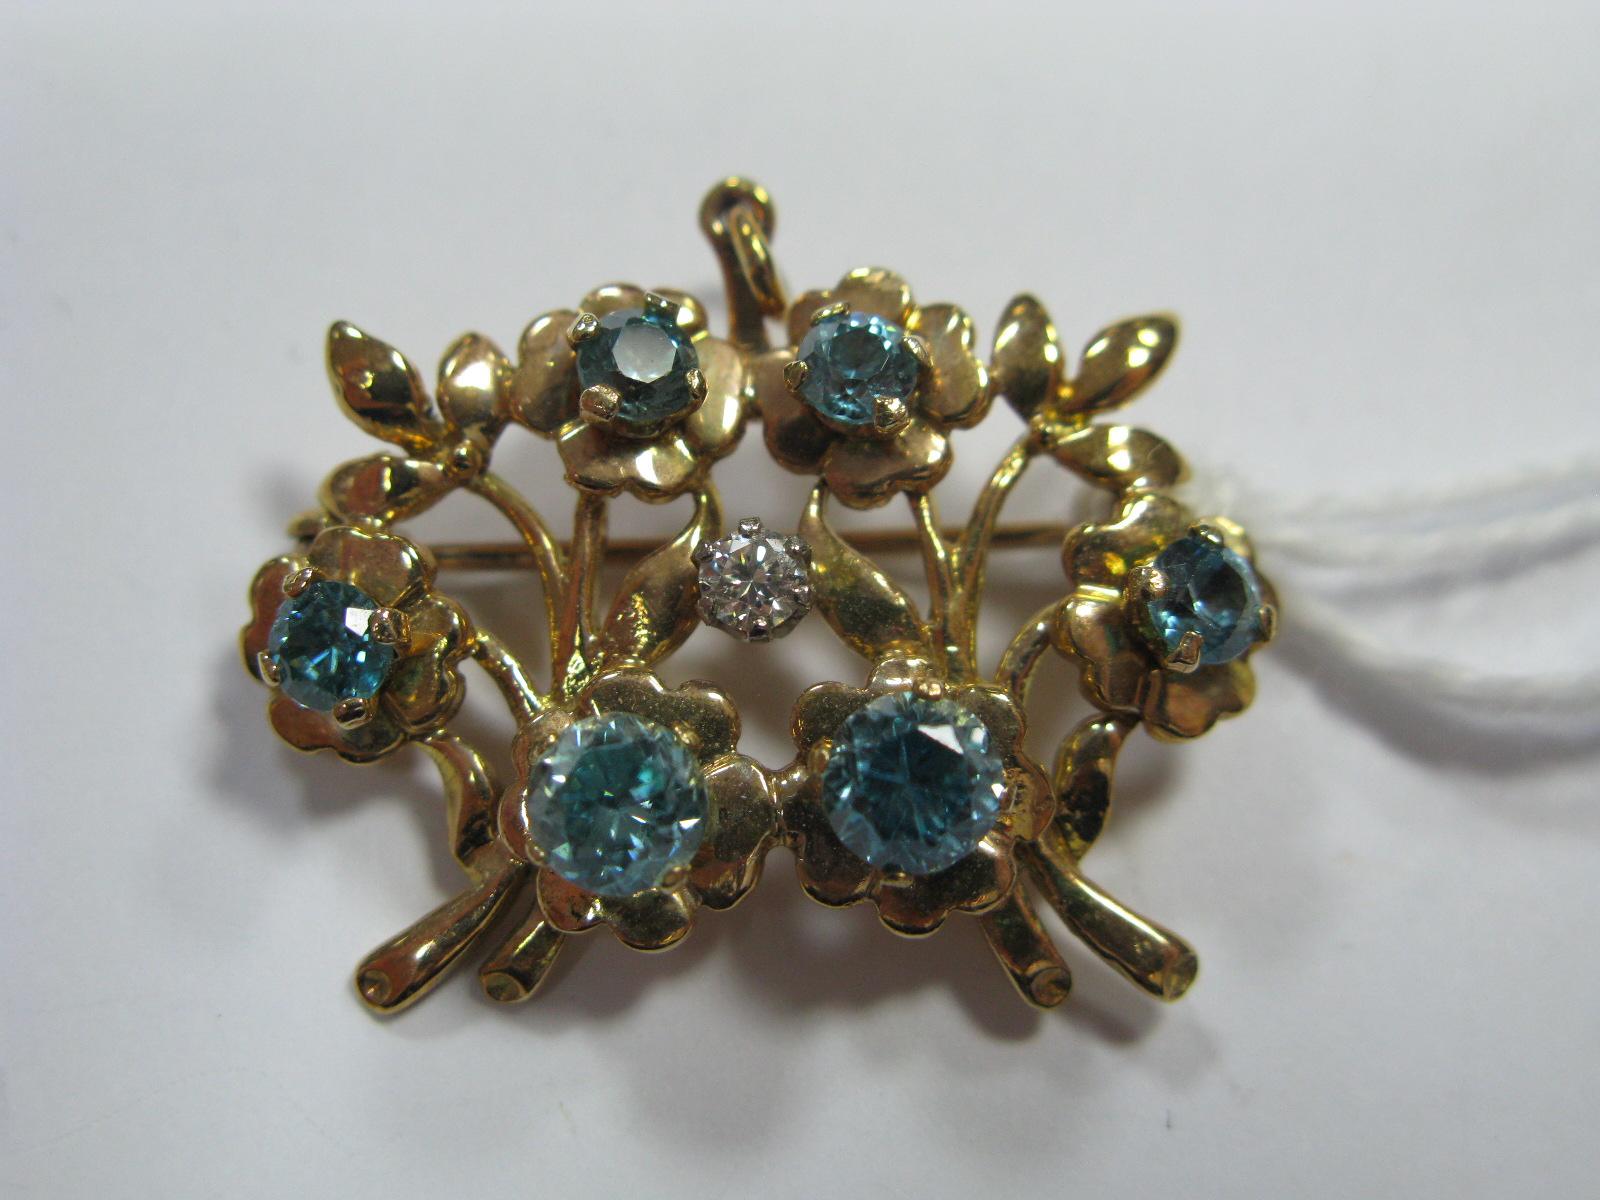 Lot 1363 - A Modern Floral Design Blue Zircon Set Brooch/Pendant.